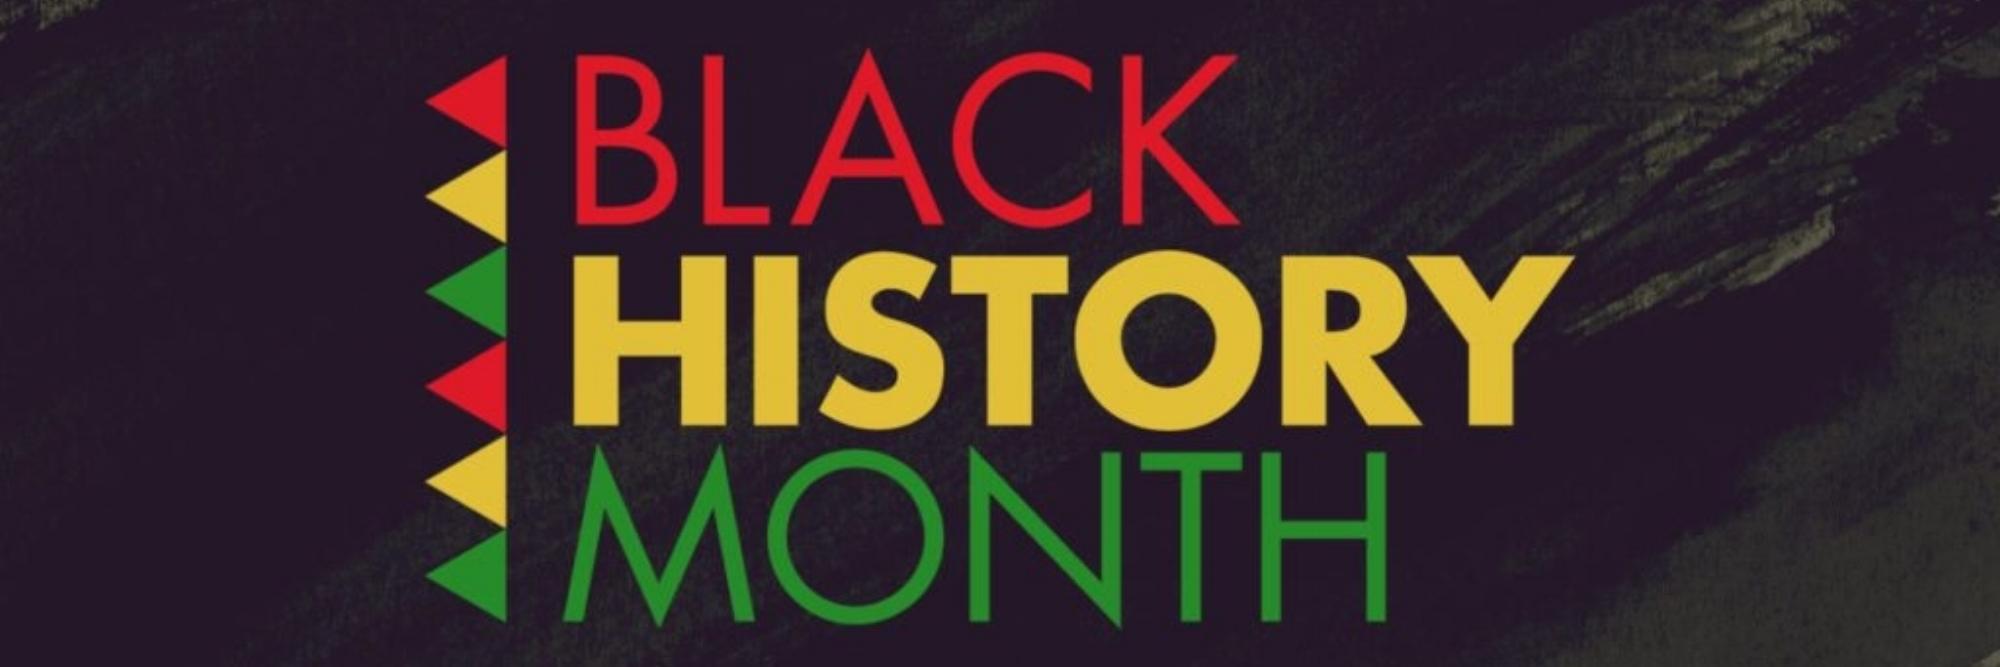 black-history-wallpaper-9-1024x576.jpg